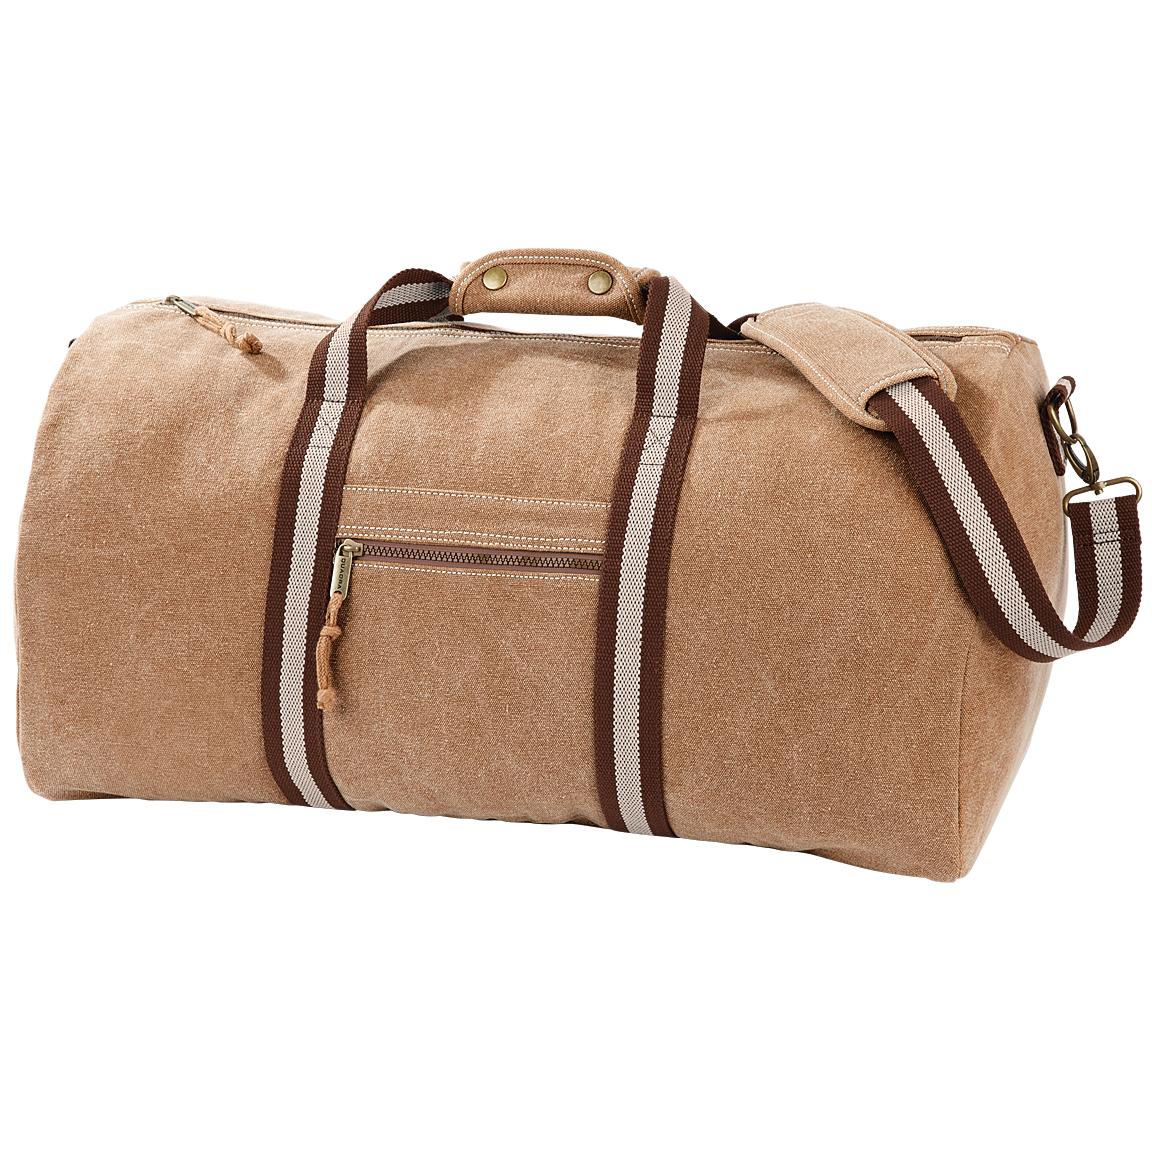 Quadra Vintage Canvas Holdall Duffle Bag - 45 Litres (One Size) (Sahara)